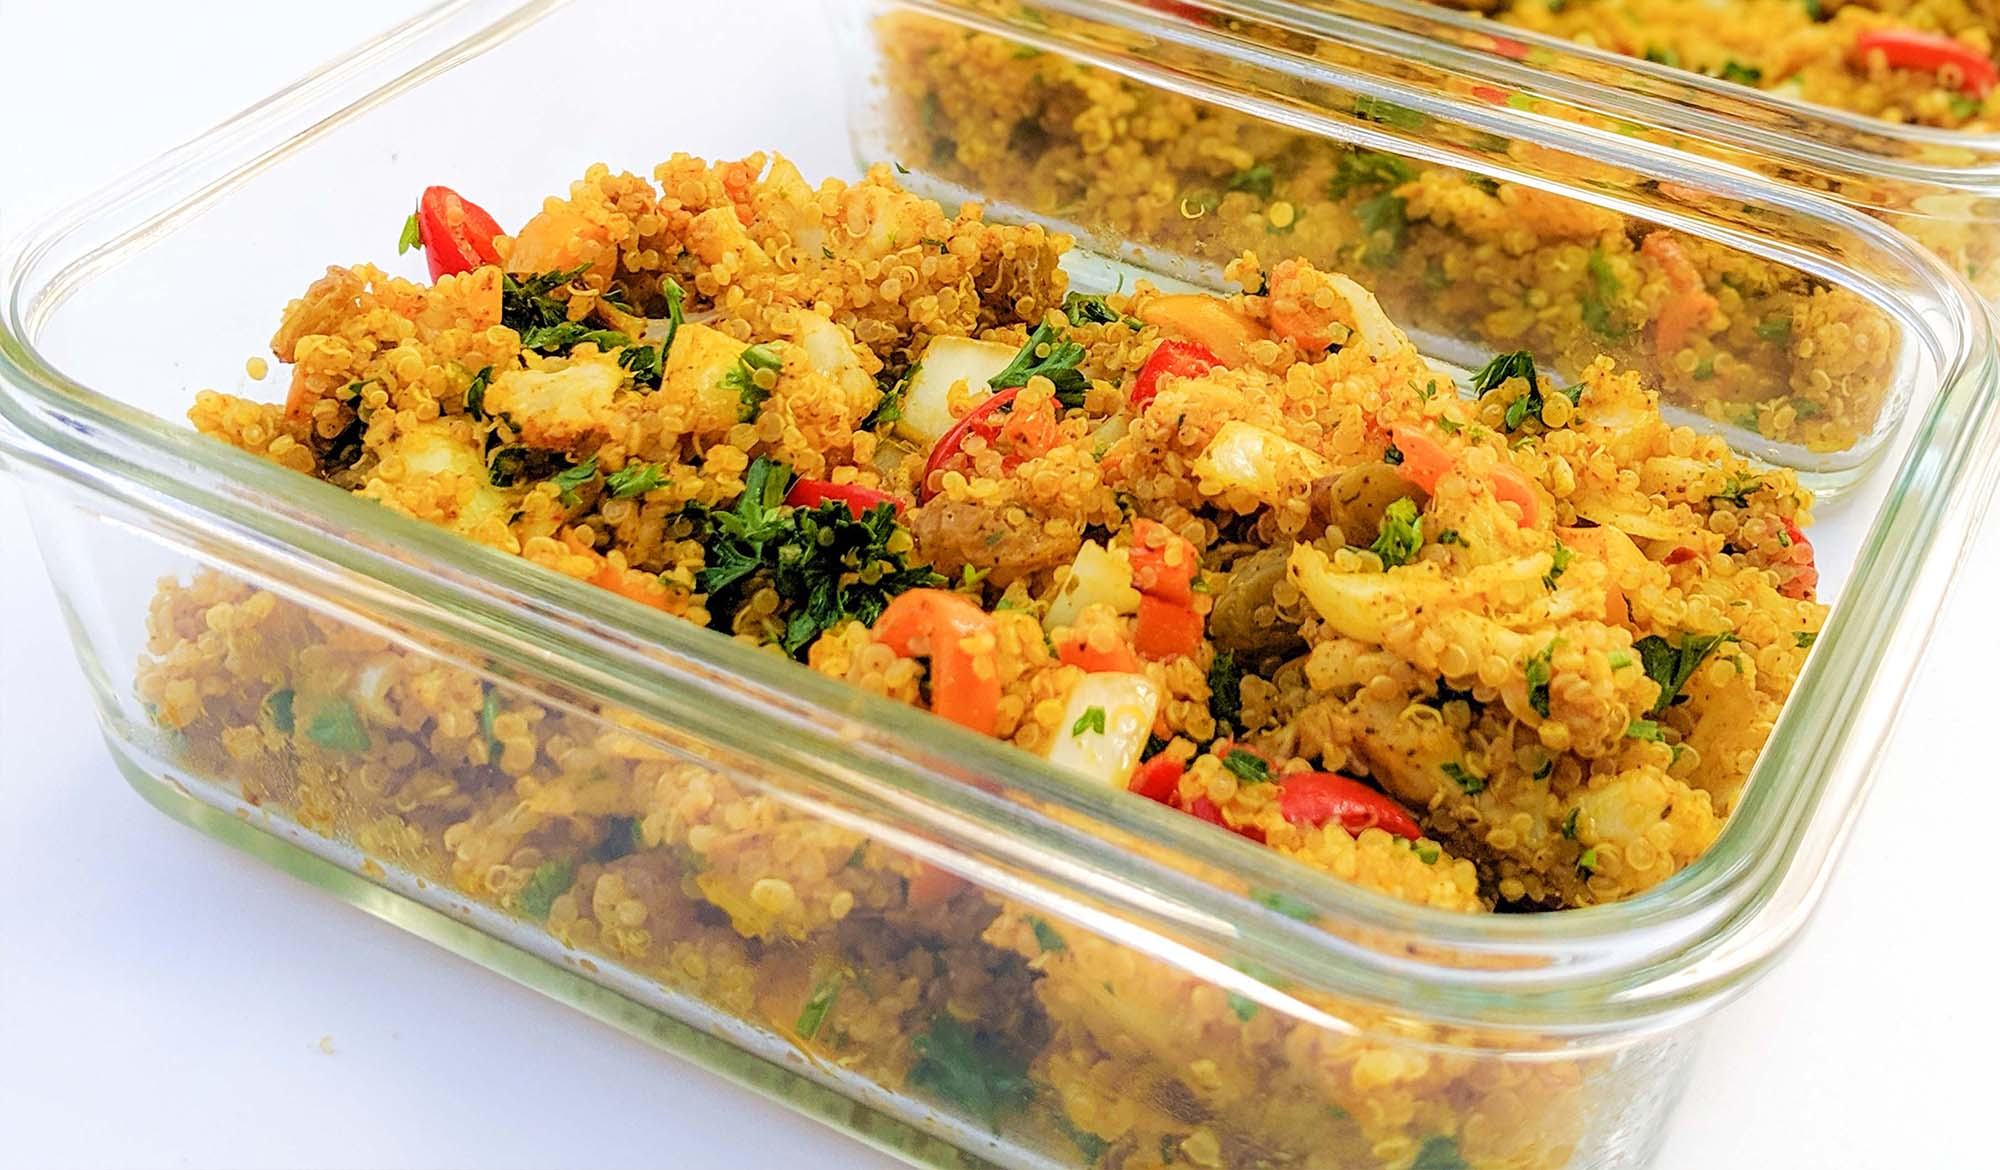 curried-quinoa-cauliflower-recipe-meal-prep (2) (1)